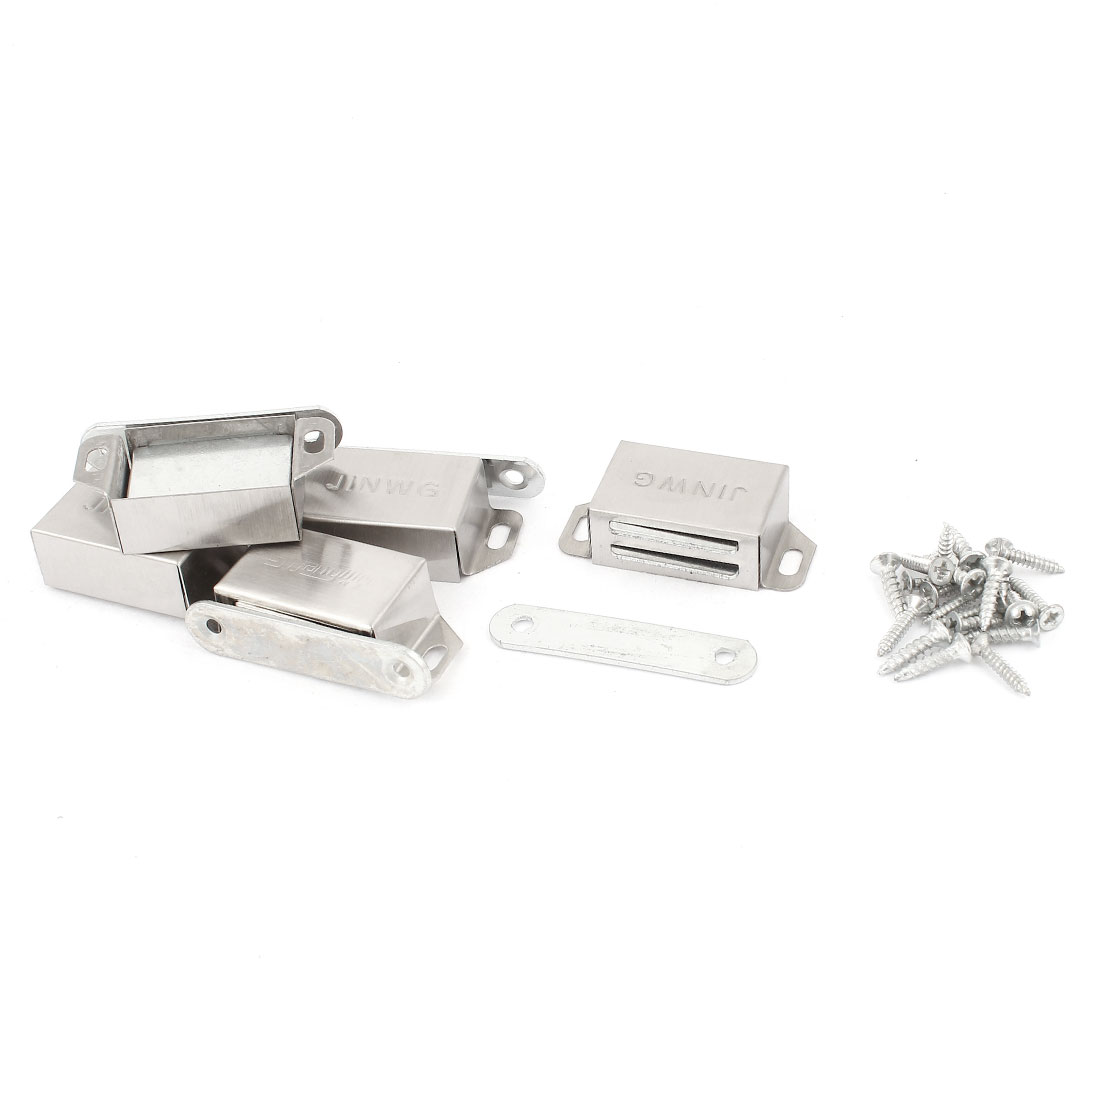 Cupboard Cabinet 51 x 27mm Magnetic Door Catch Magnet Holder Latch 5 Set